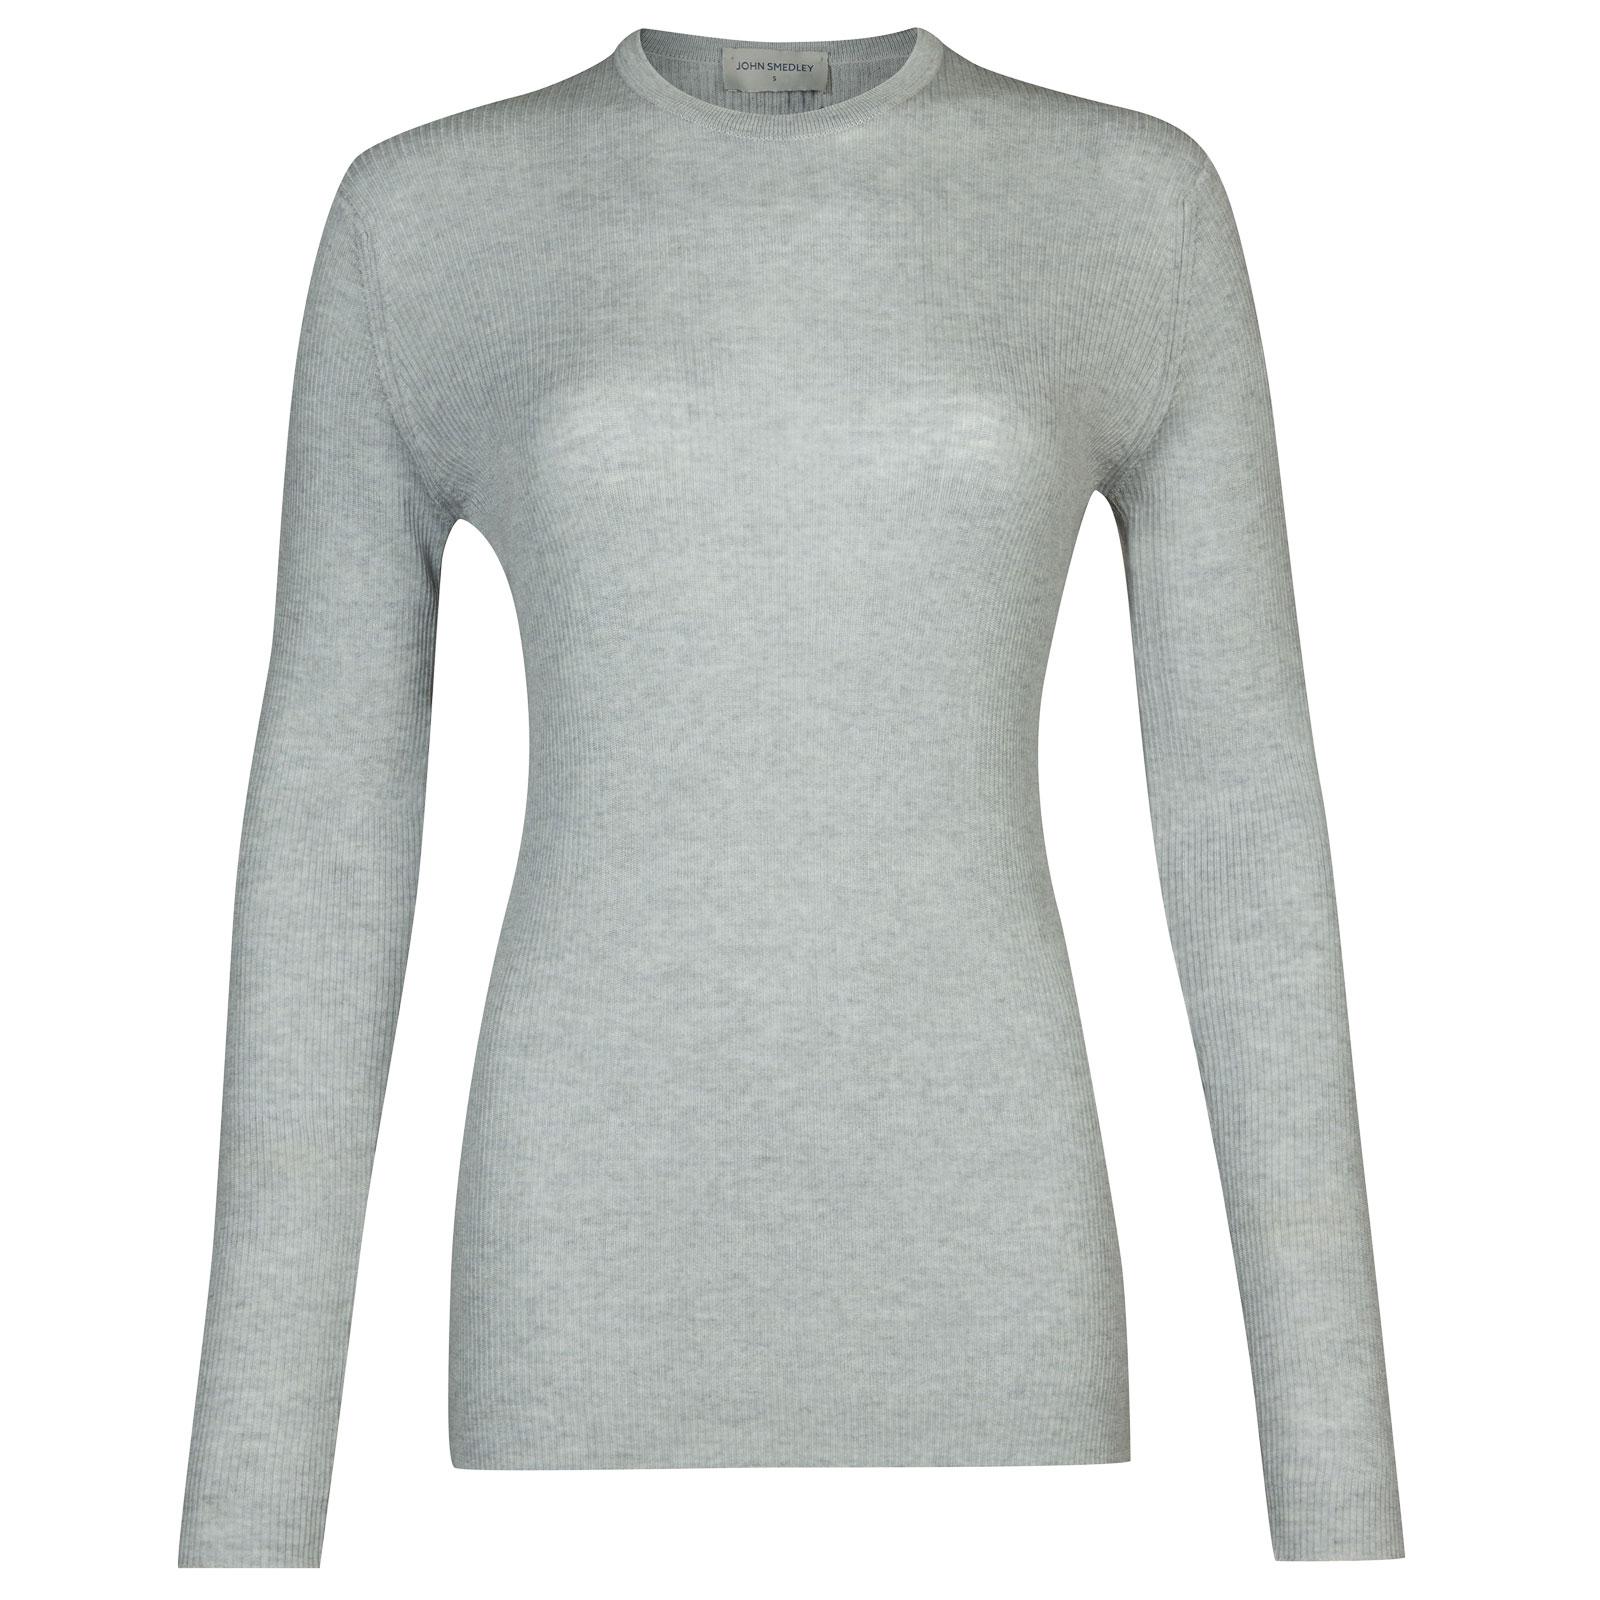 John Smedley corey Merino Wool Sweater in Bardot Grey-M